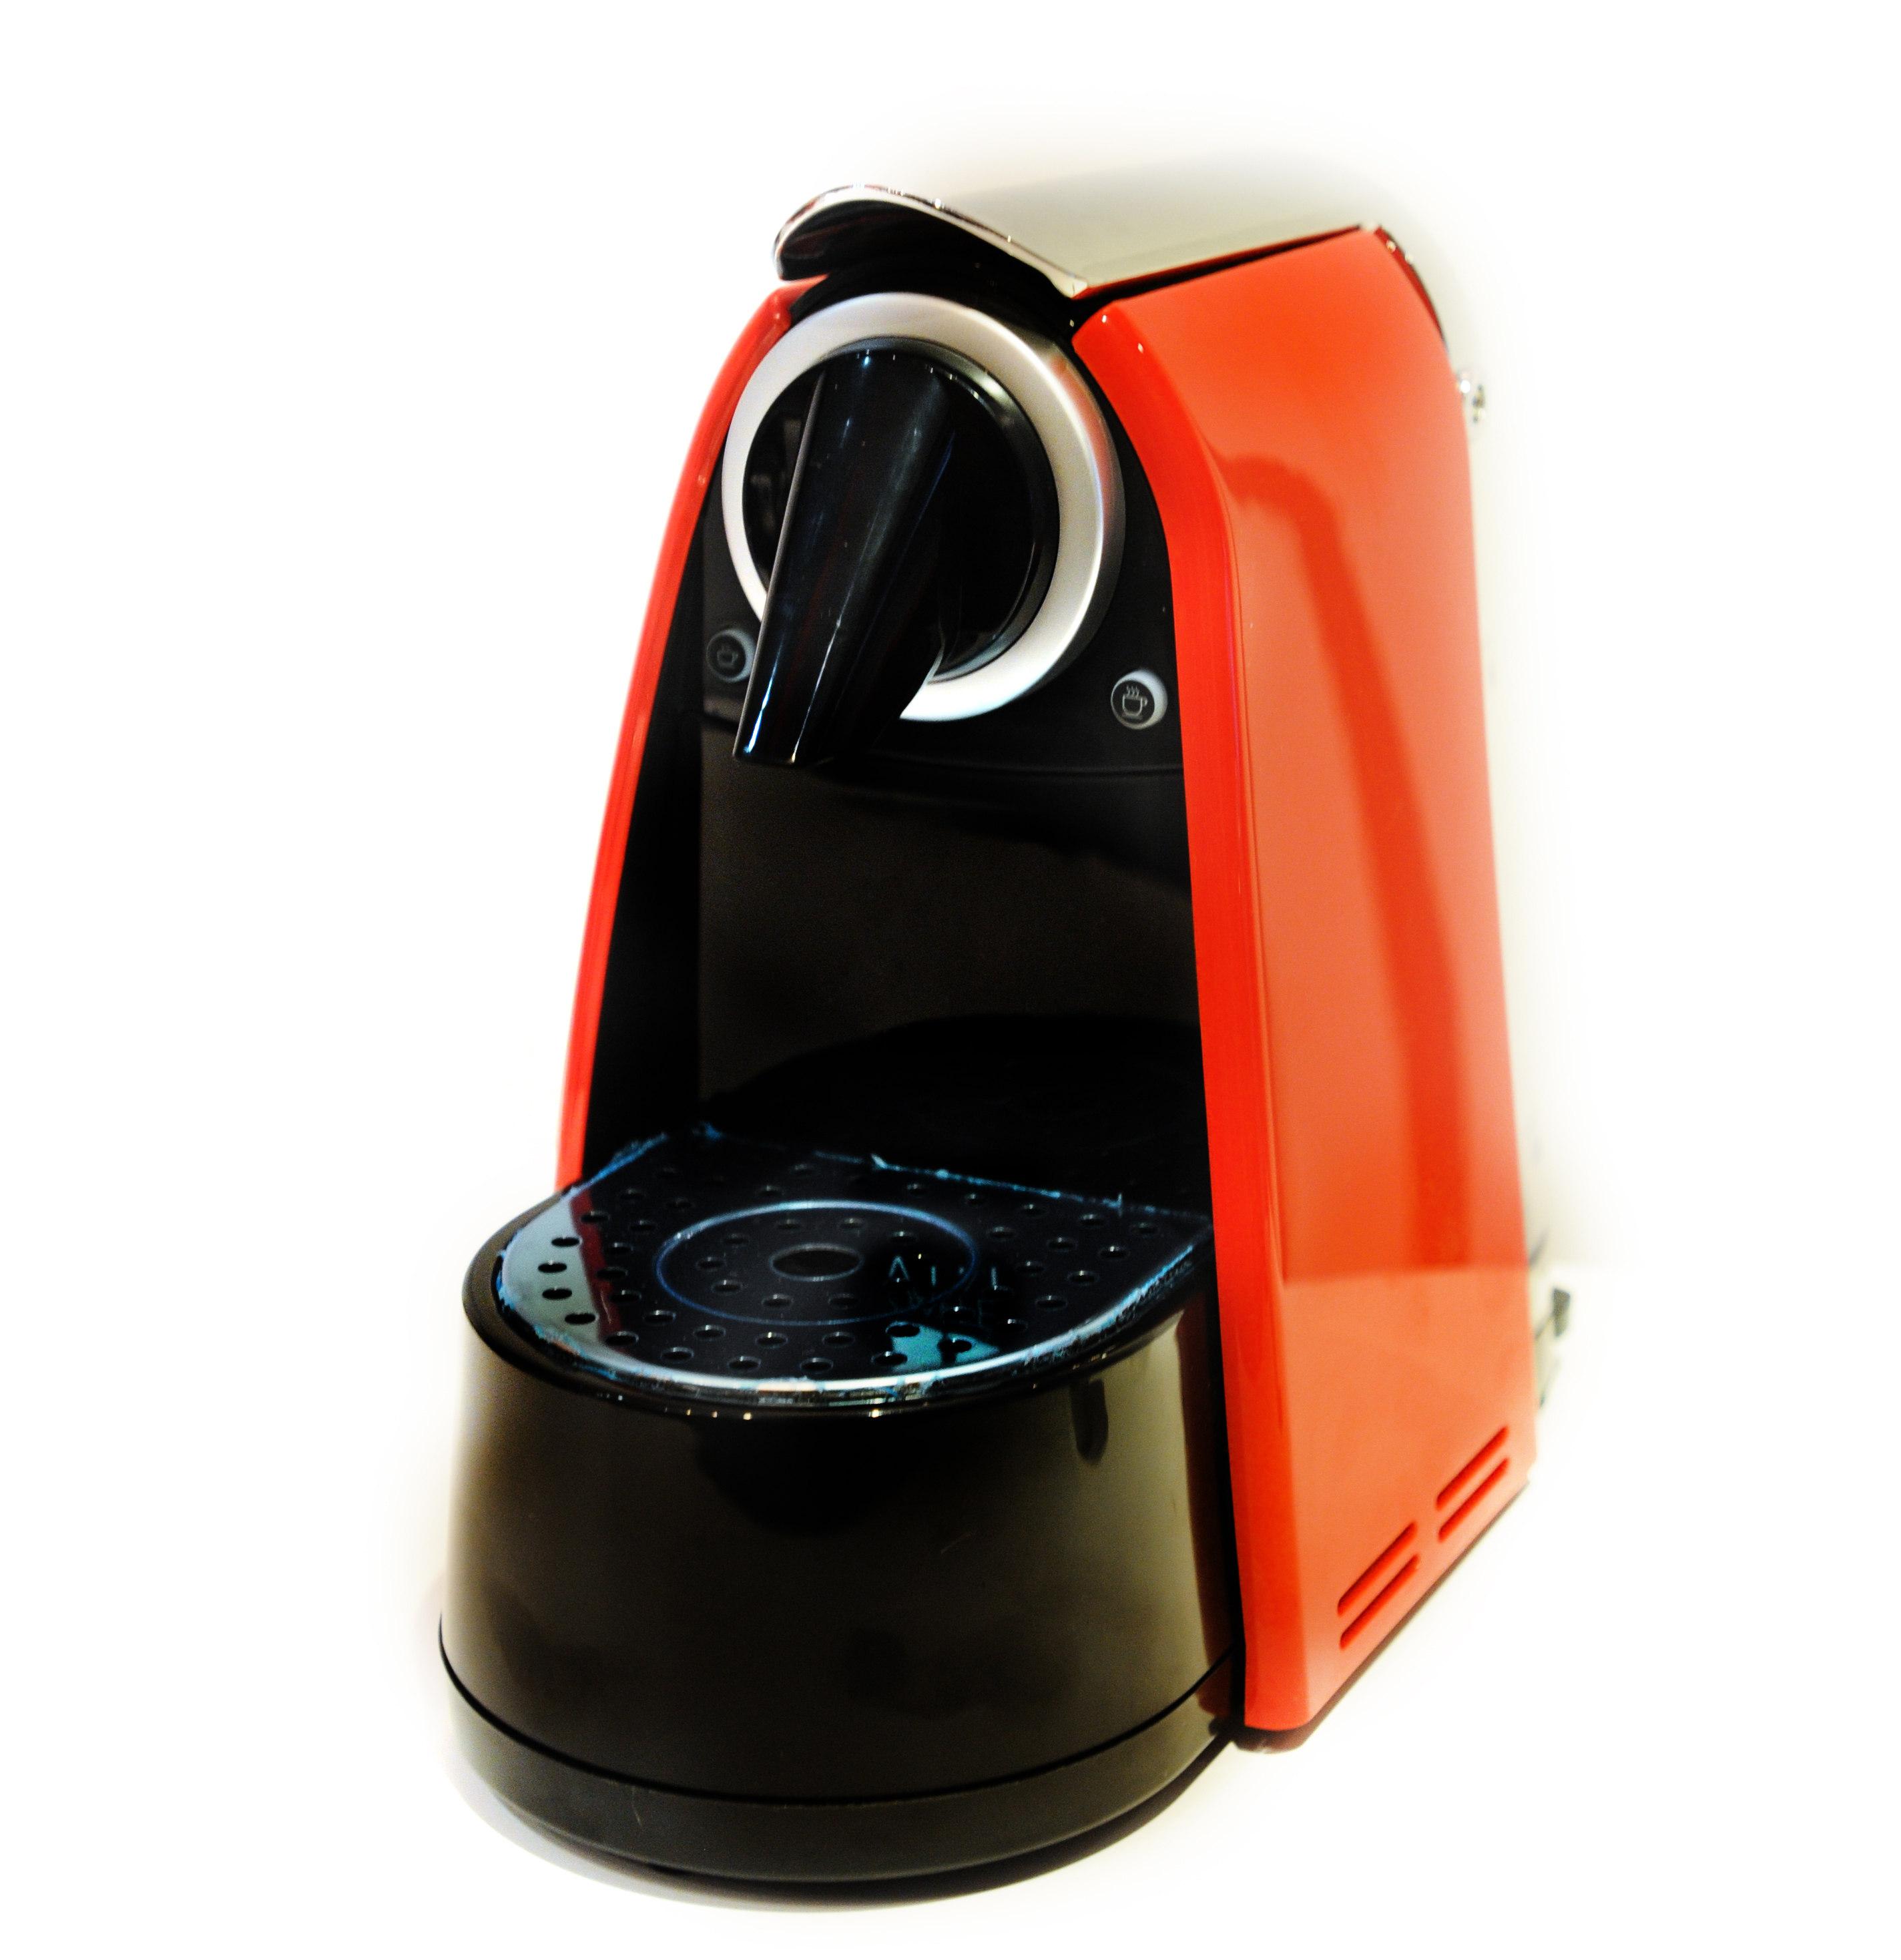 Macchine a Capsule Espresso Point Rossa